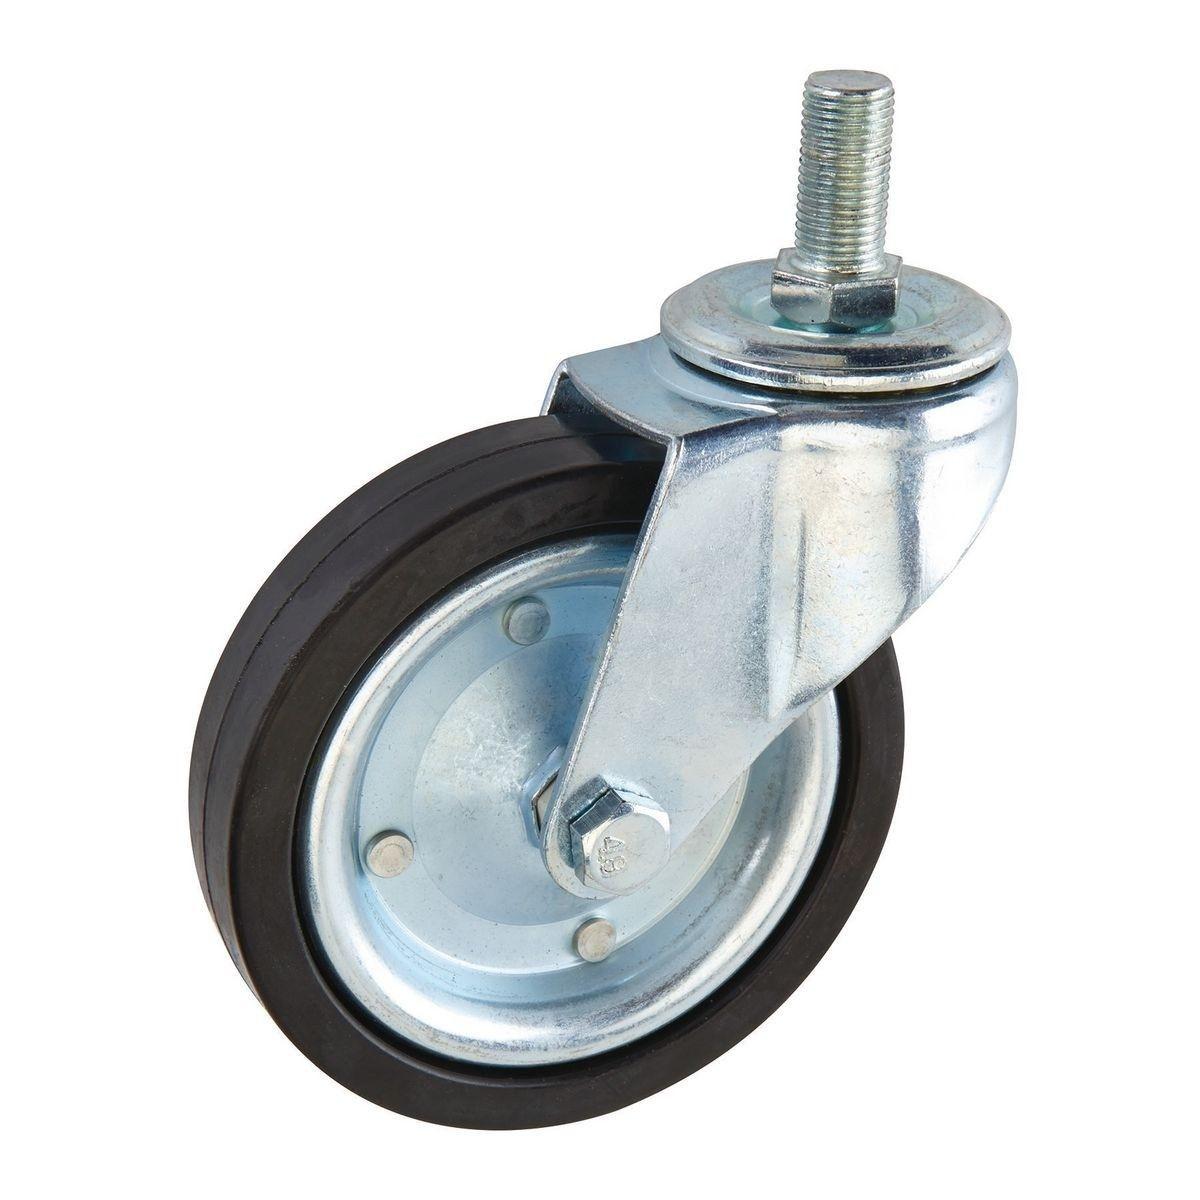 Caster Double Bearing Furniture Hardware All Size Nylon Swivel Caster Wheel 4 In. Hard Rubber Heavy Duty Swivel Caster